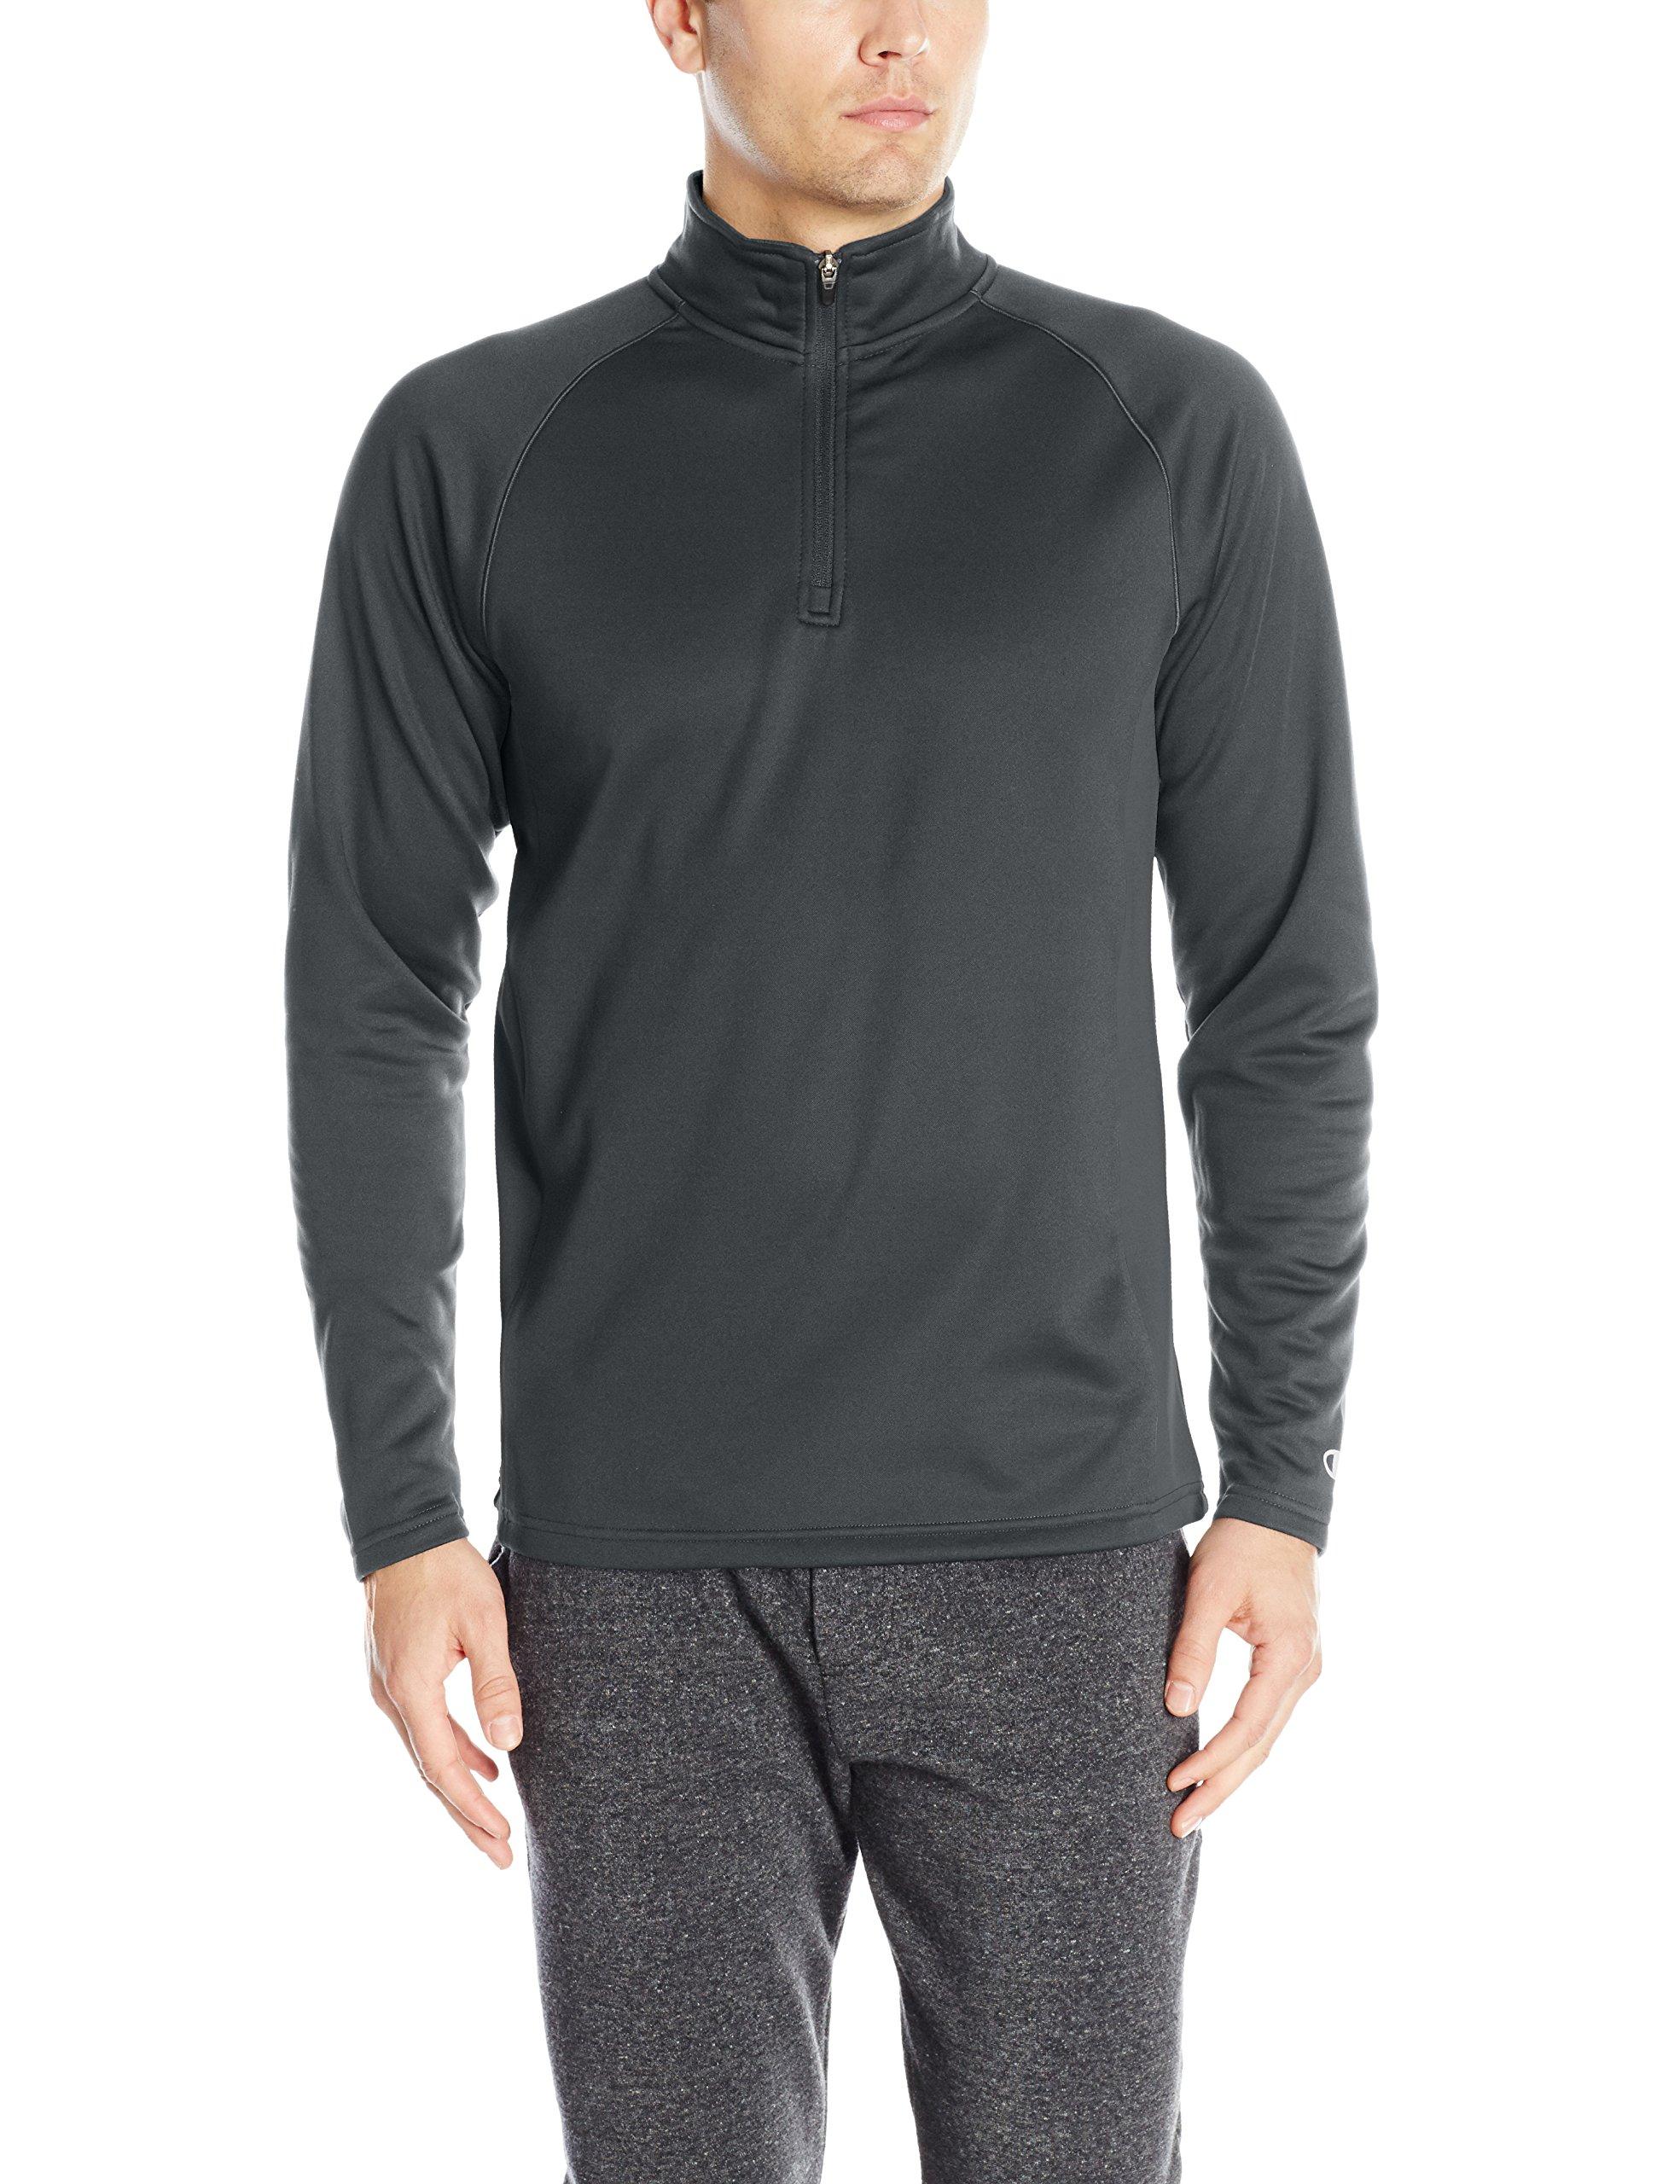 Champion Men's Performance Quarter Zip Fleece Jacket, Black/Black, Small